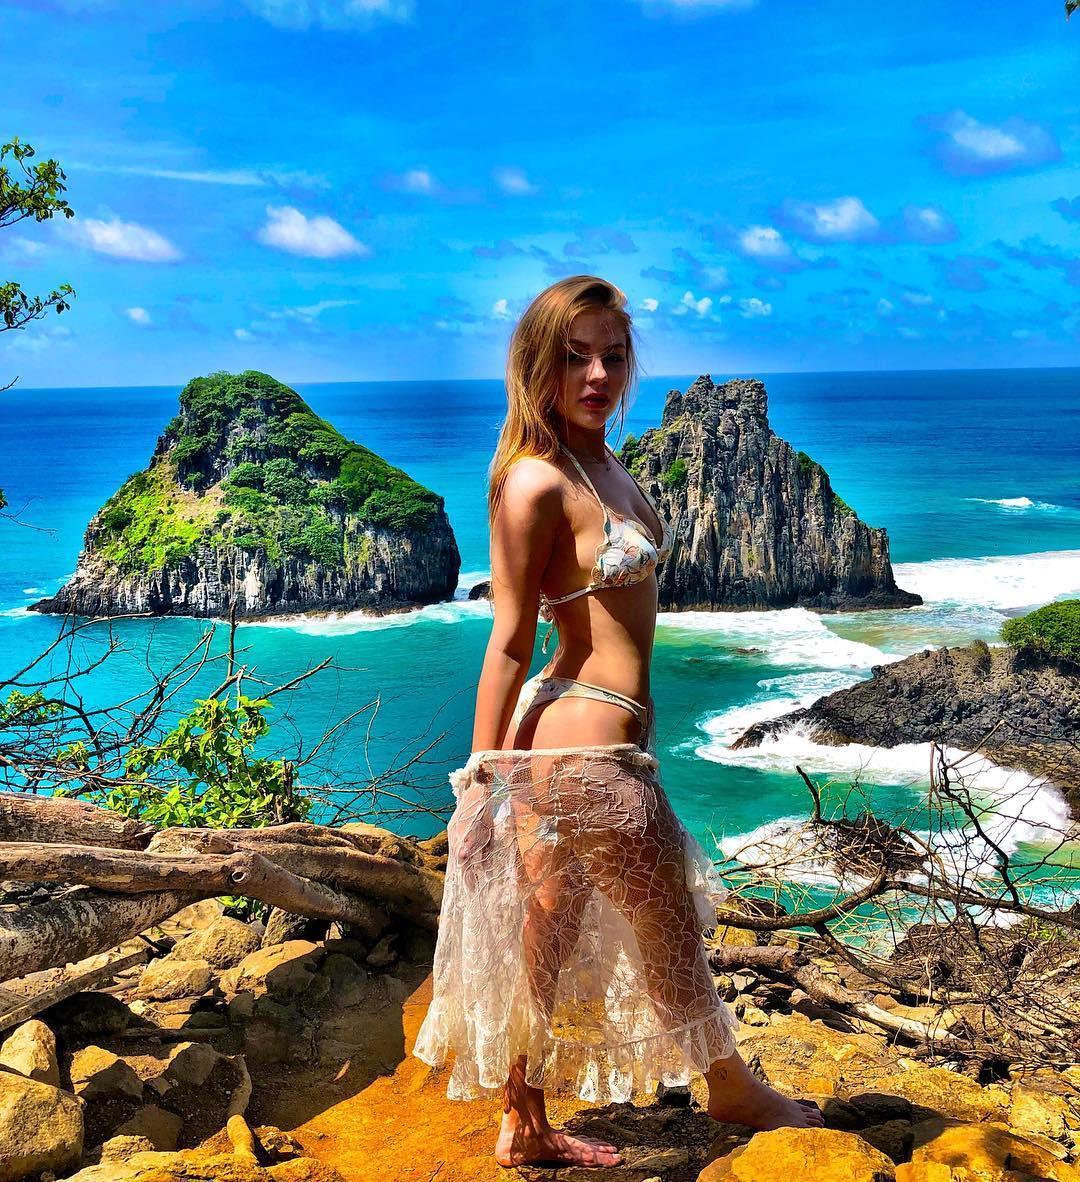 As fotos mais sexy de Luísa Sonza no Instagram 53